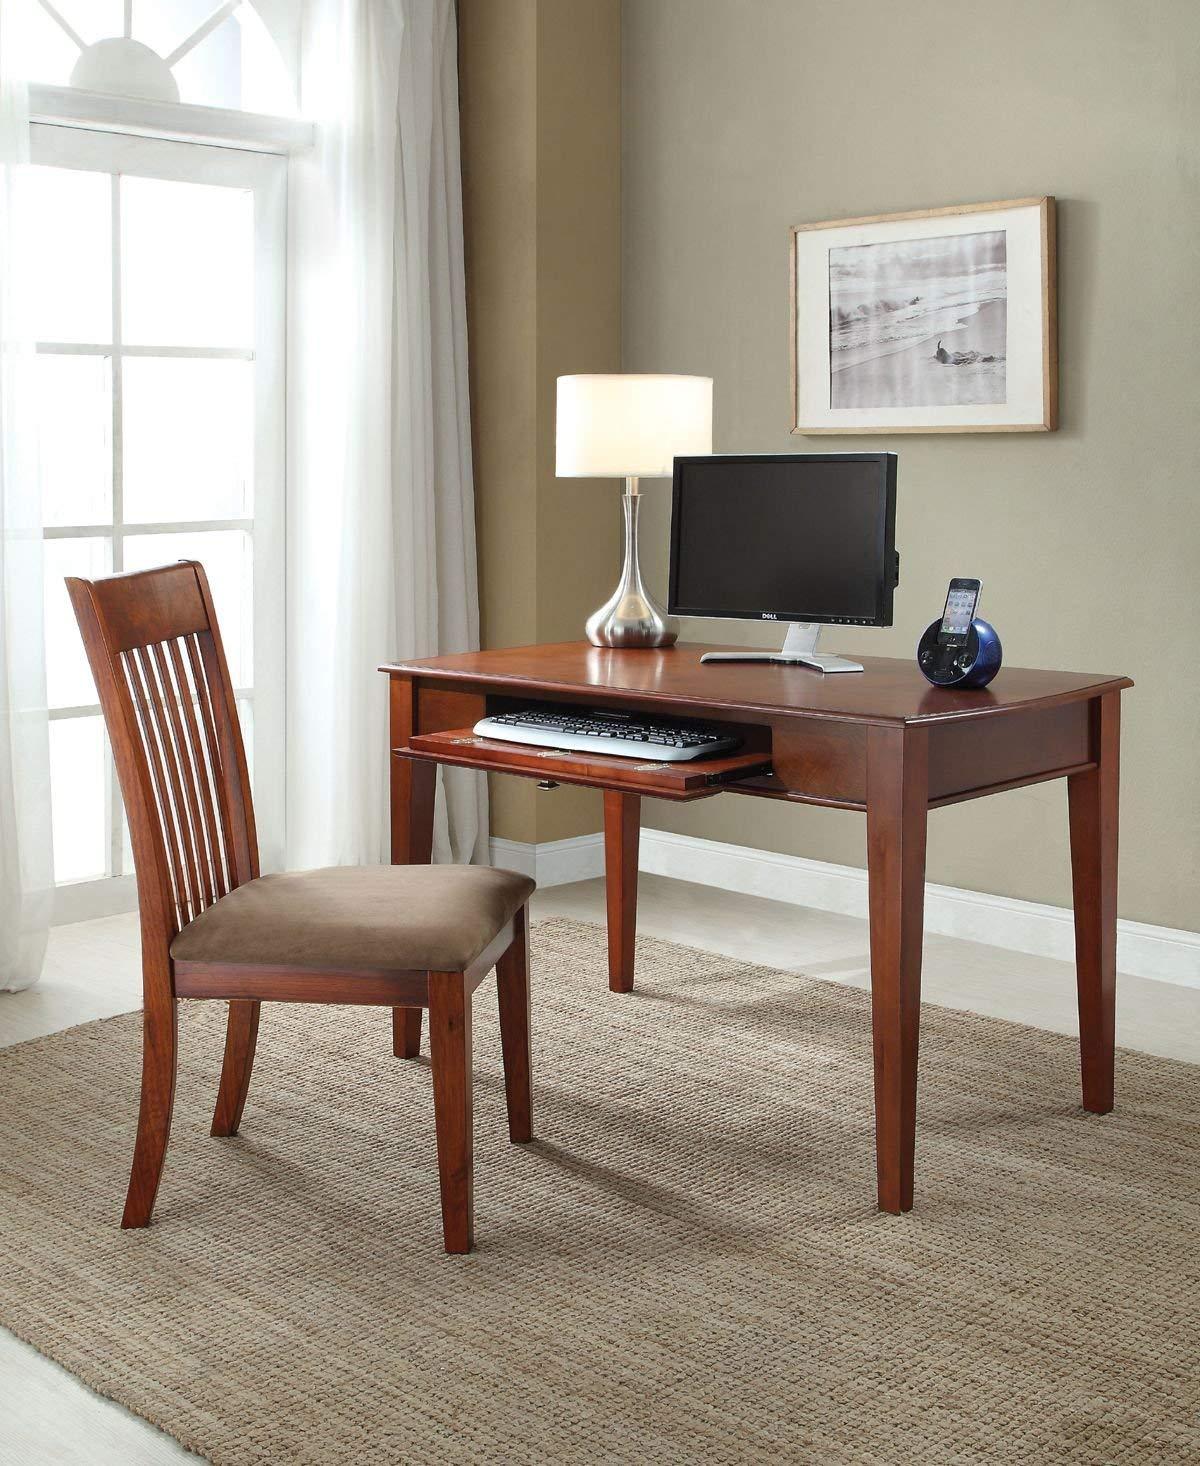 Major-Q Office Desk + Chair Set Oak Finish